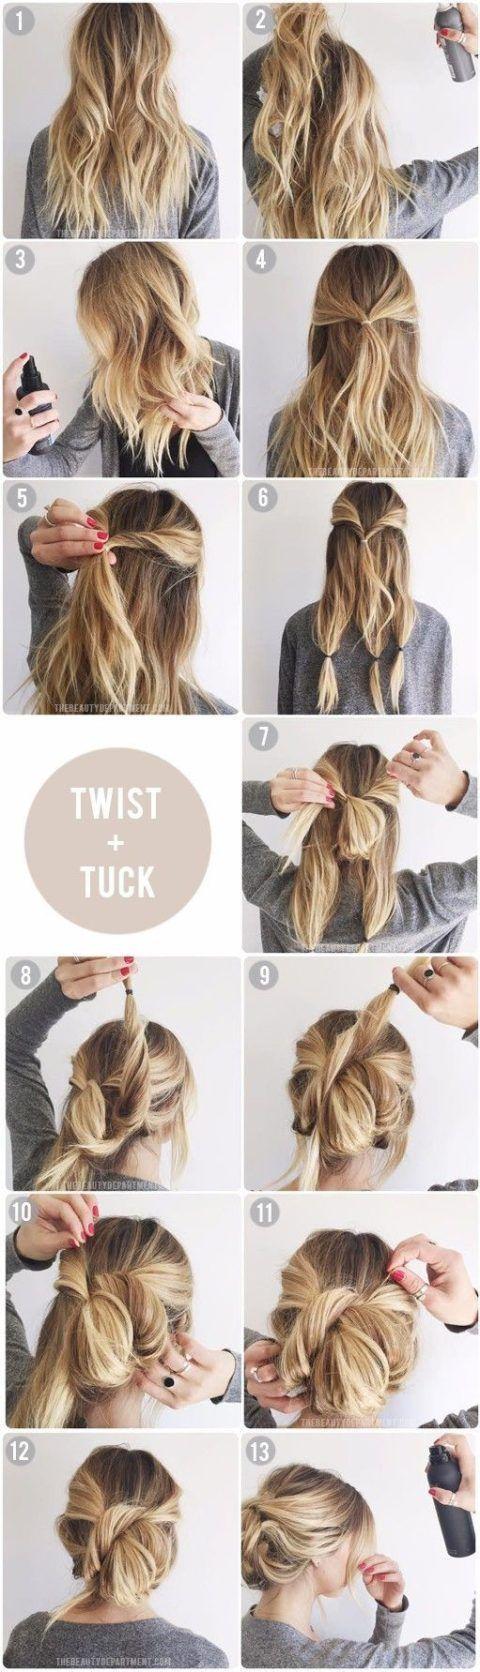 The best hair tutorials on pinterest courtesy of lauren conradus